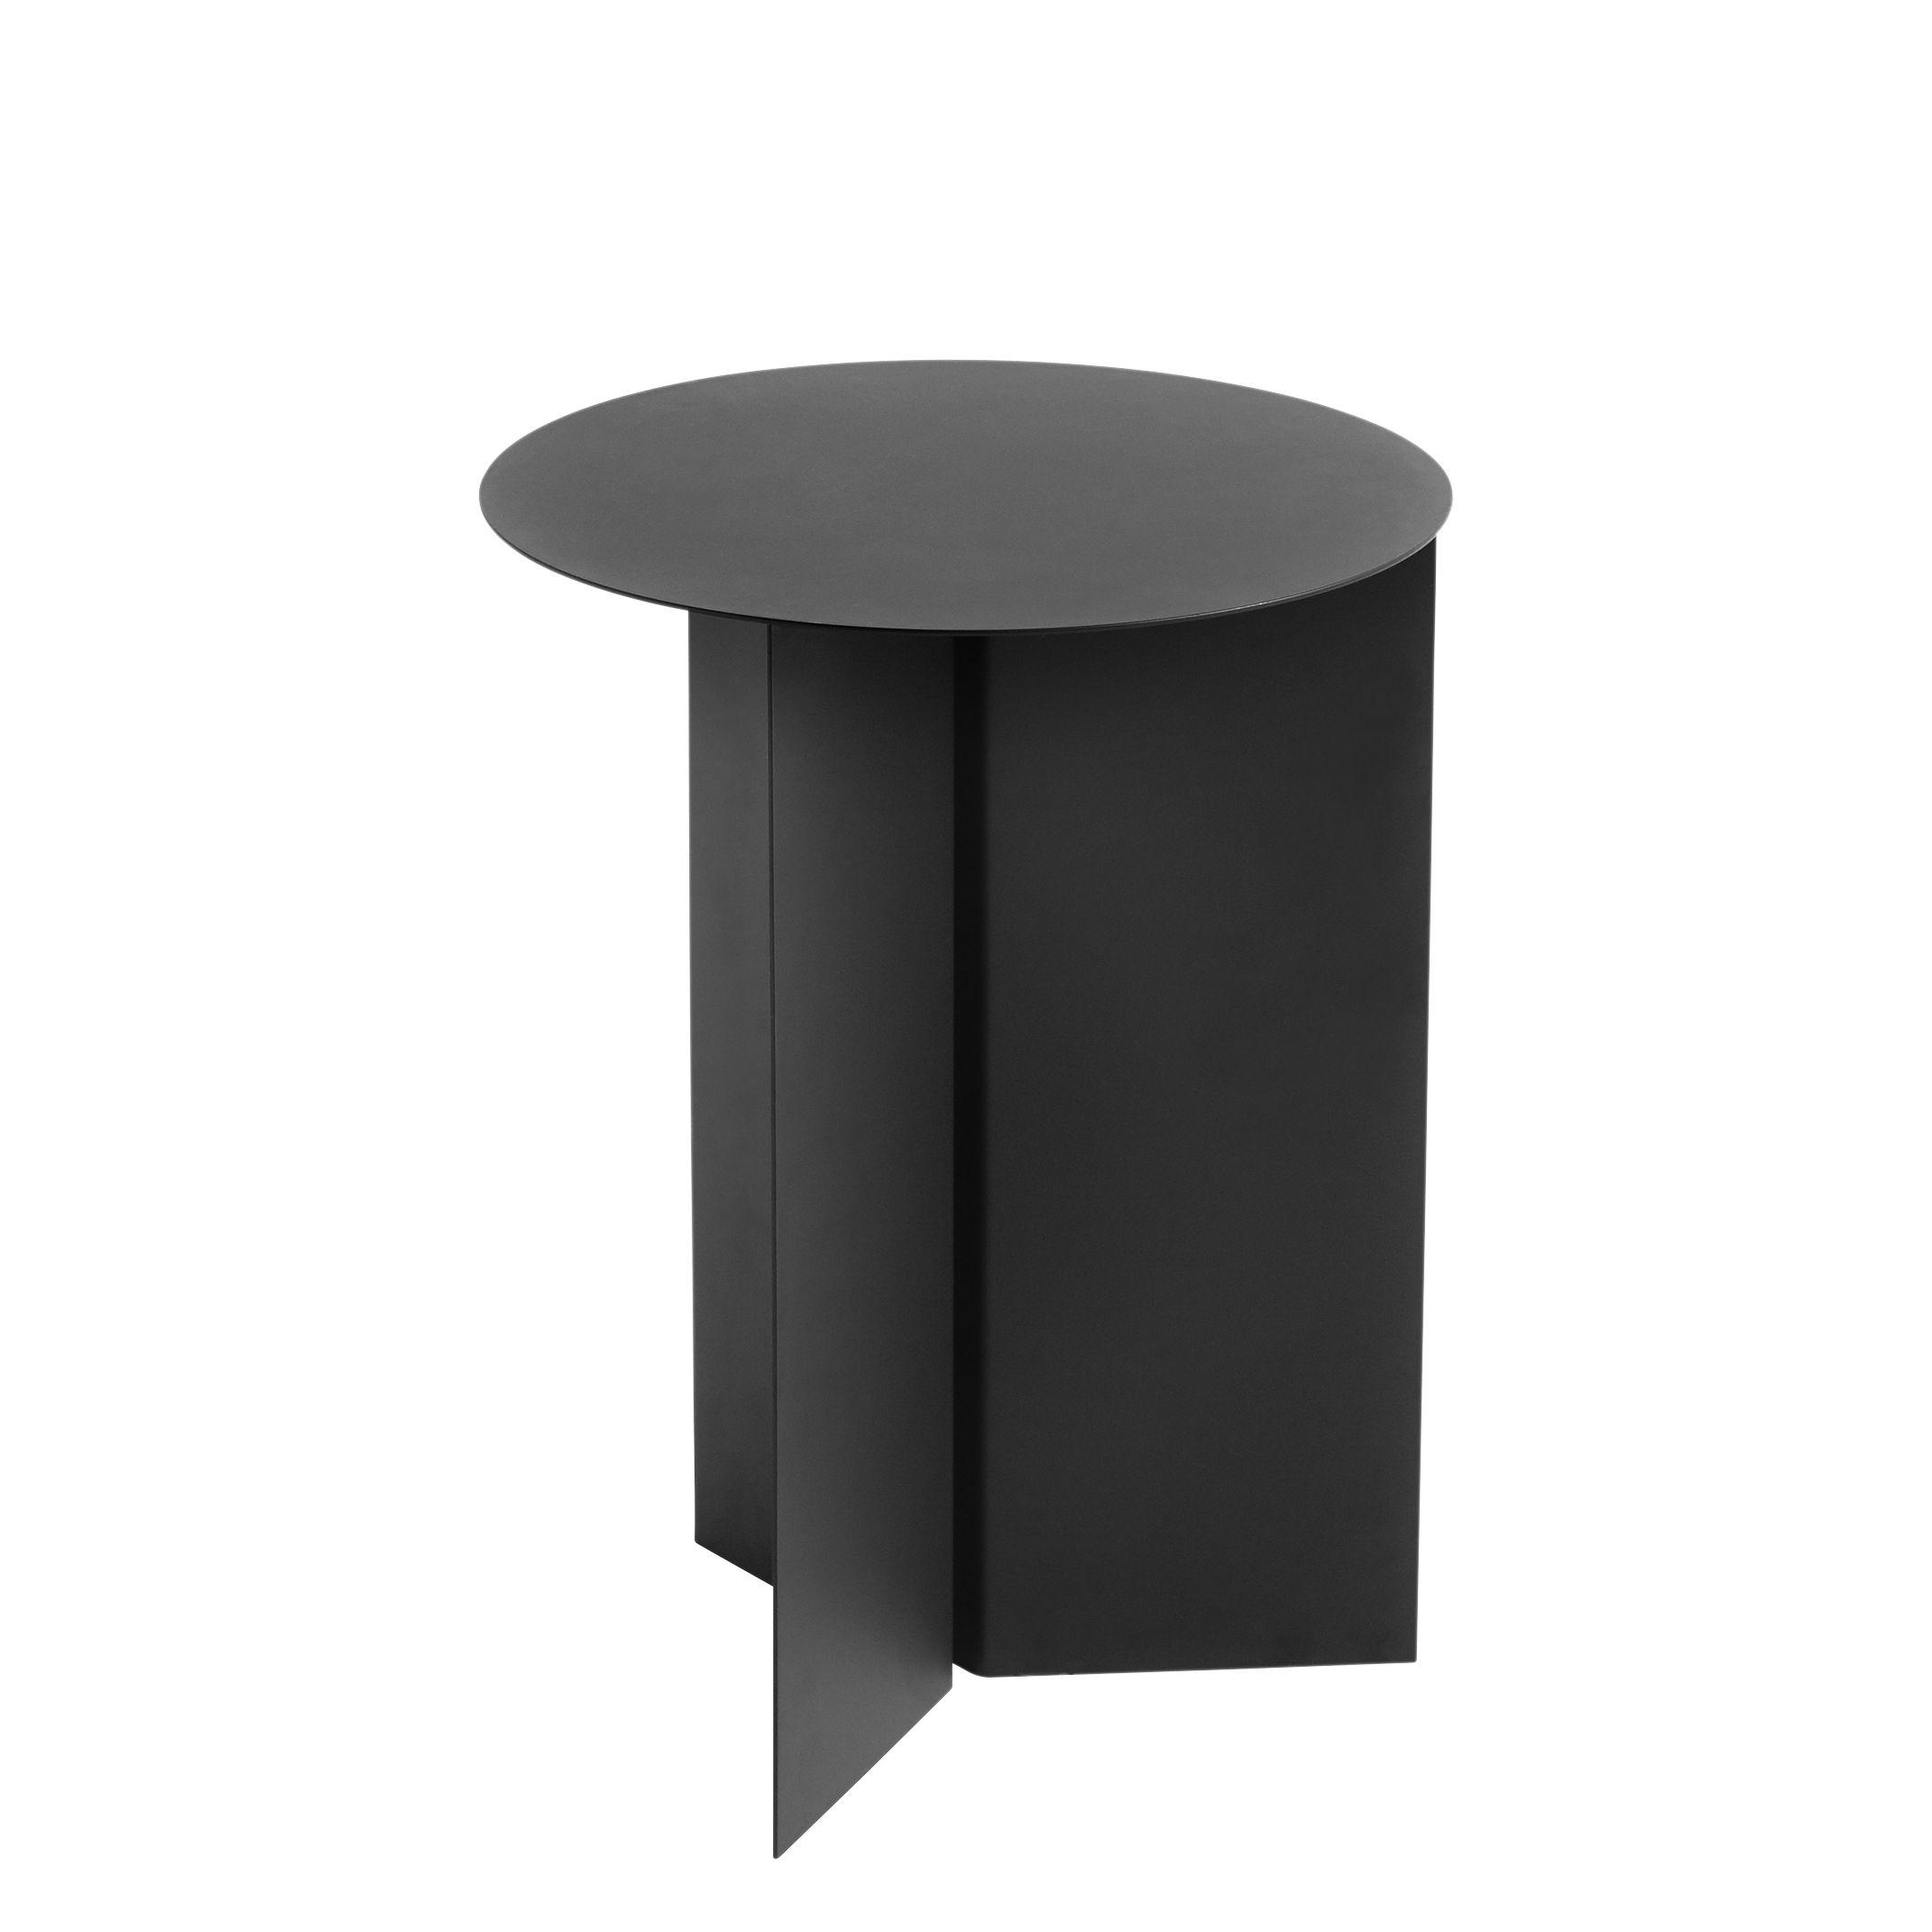 Arredamento - Tavolini  - Tavolino d'appoggio Slit Round - / Alto - Ø 35 X H 47 cm di Hay - Nero - Acier laqué époxy